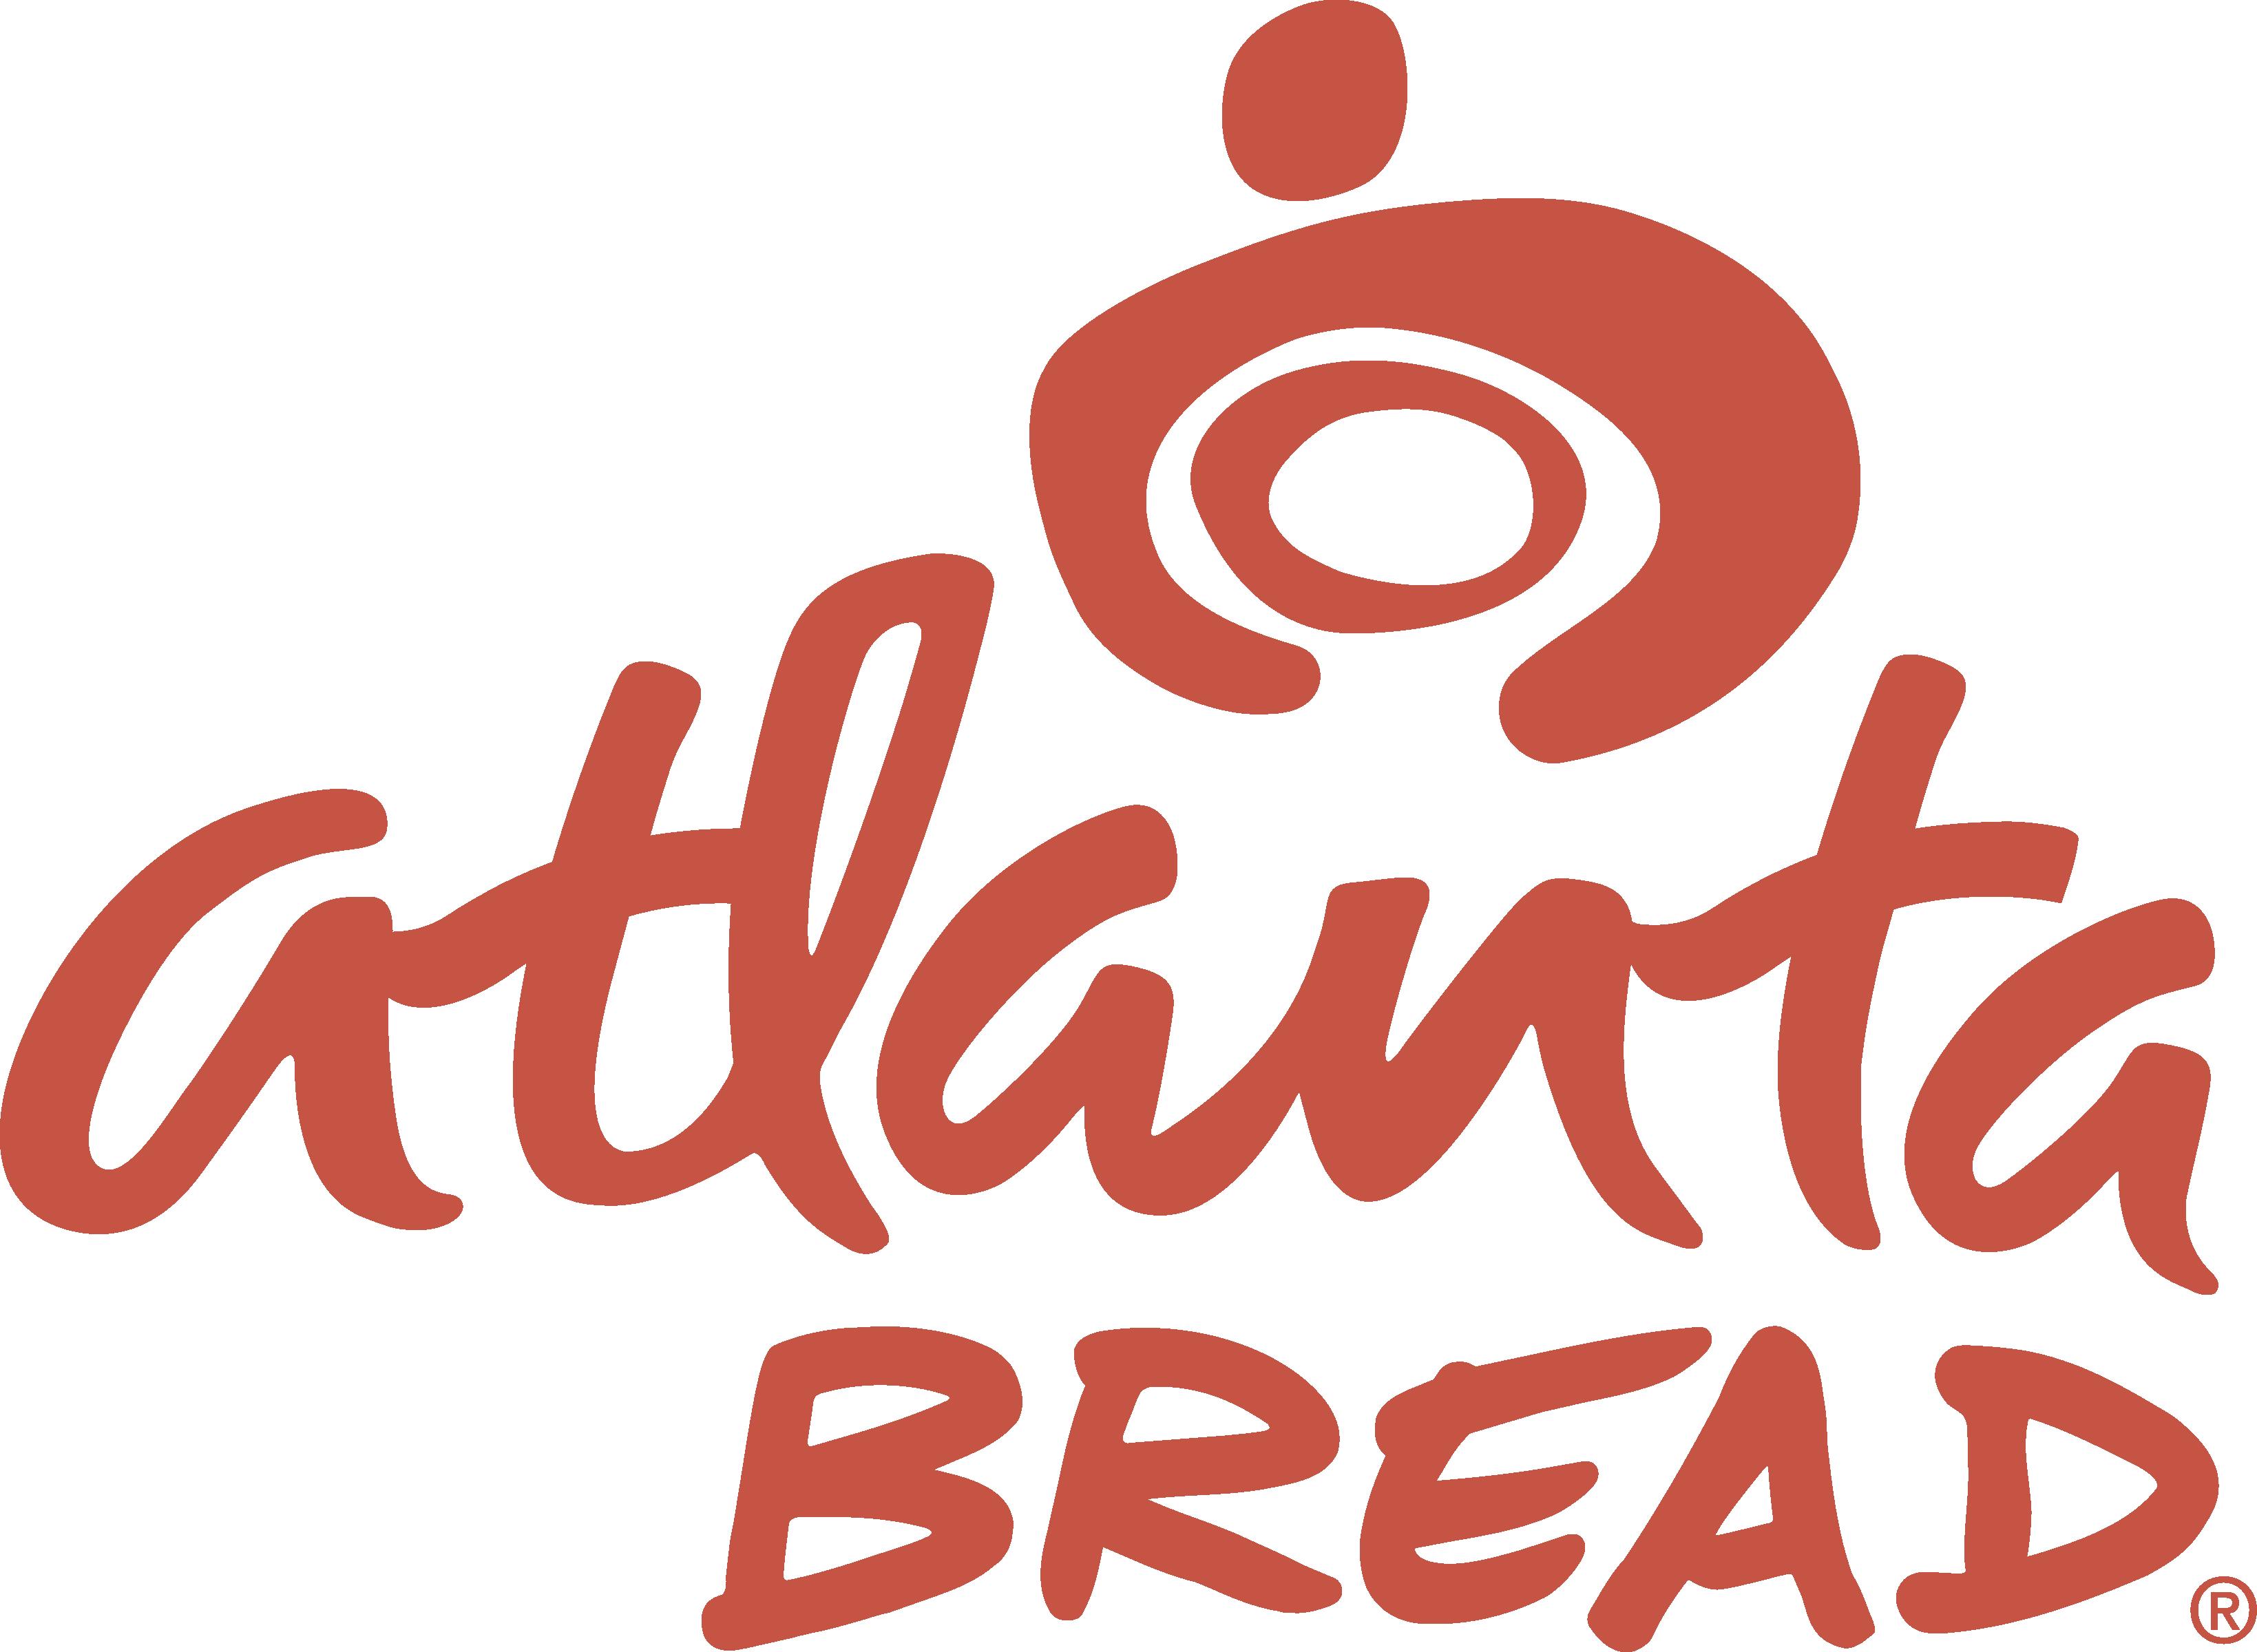 atlanta b s new branding drives café openings and enhances atlanta bread